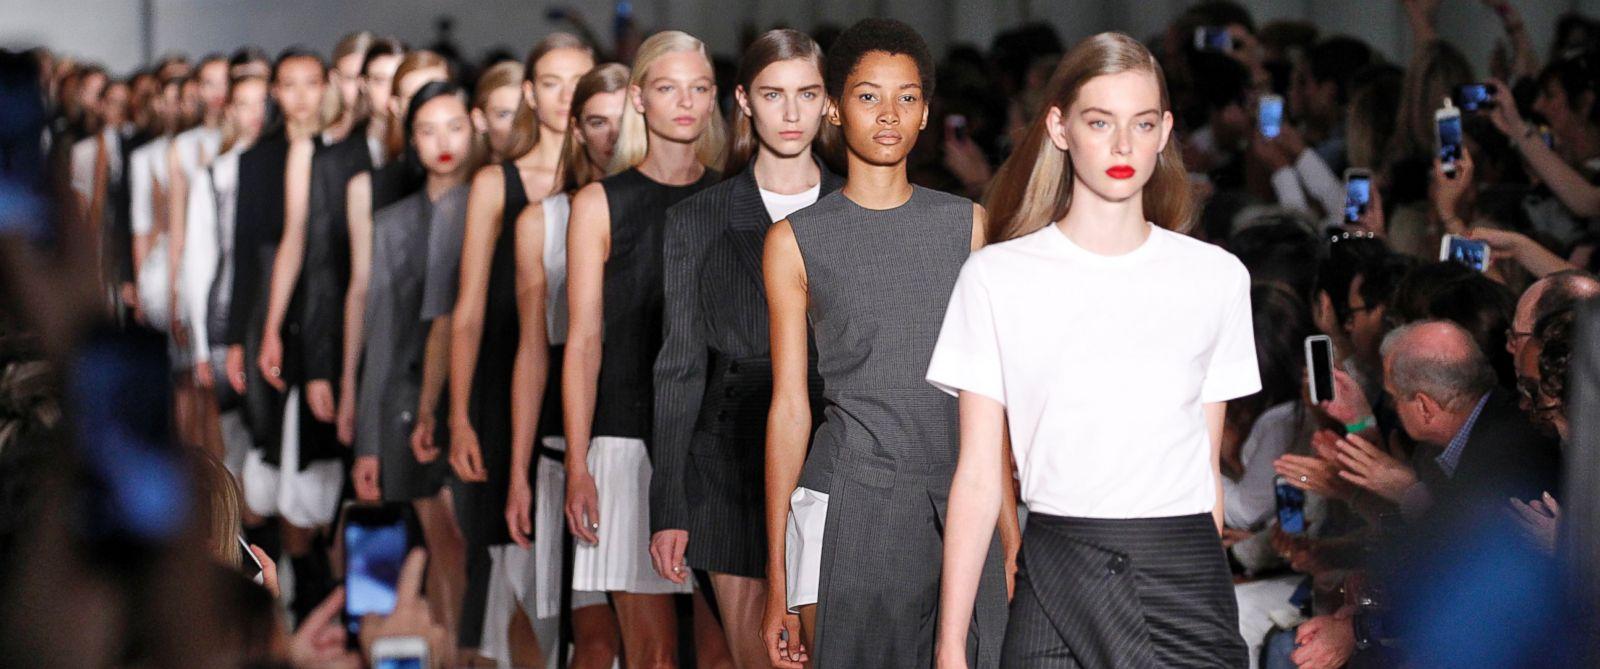 New York City: Fashion Week